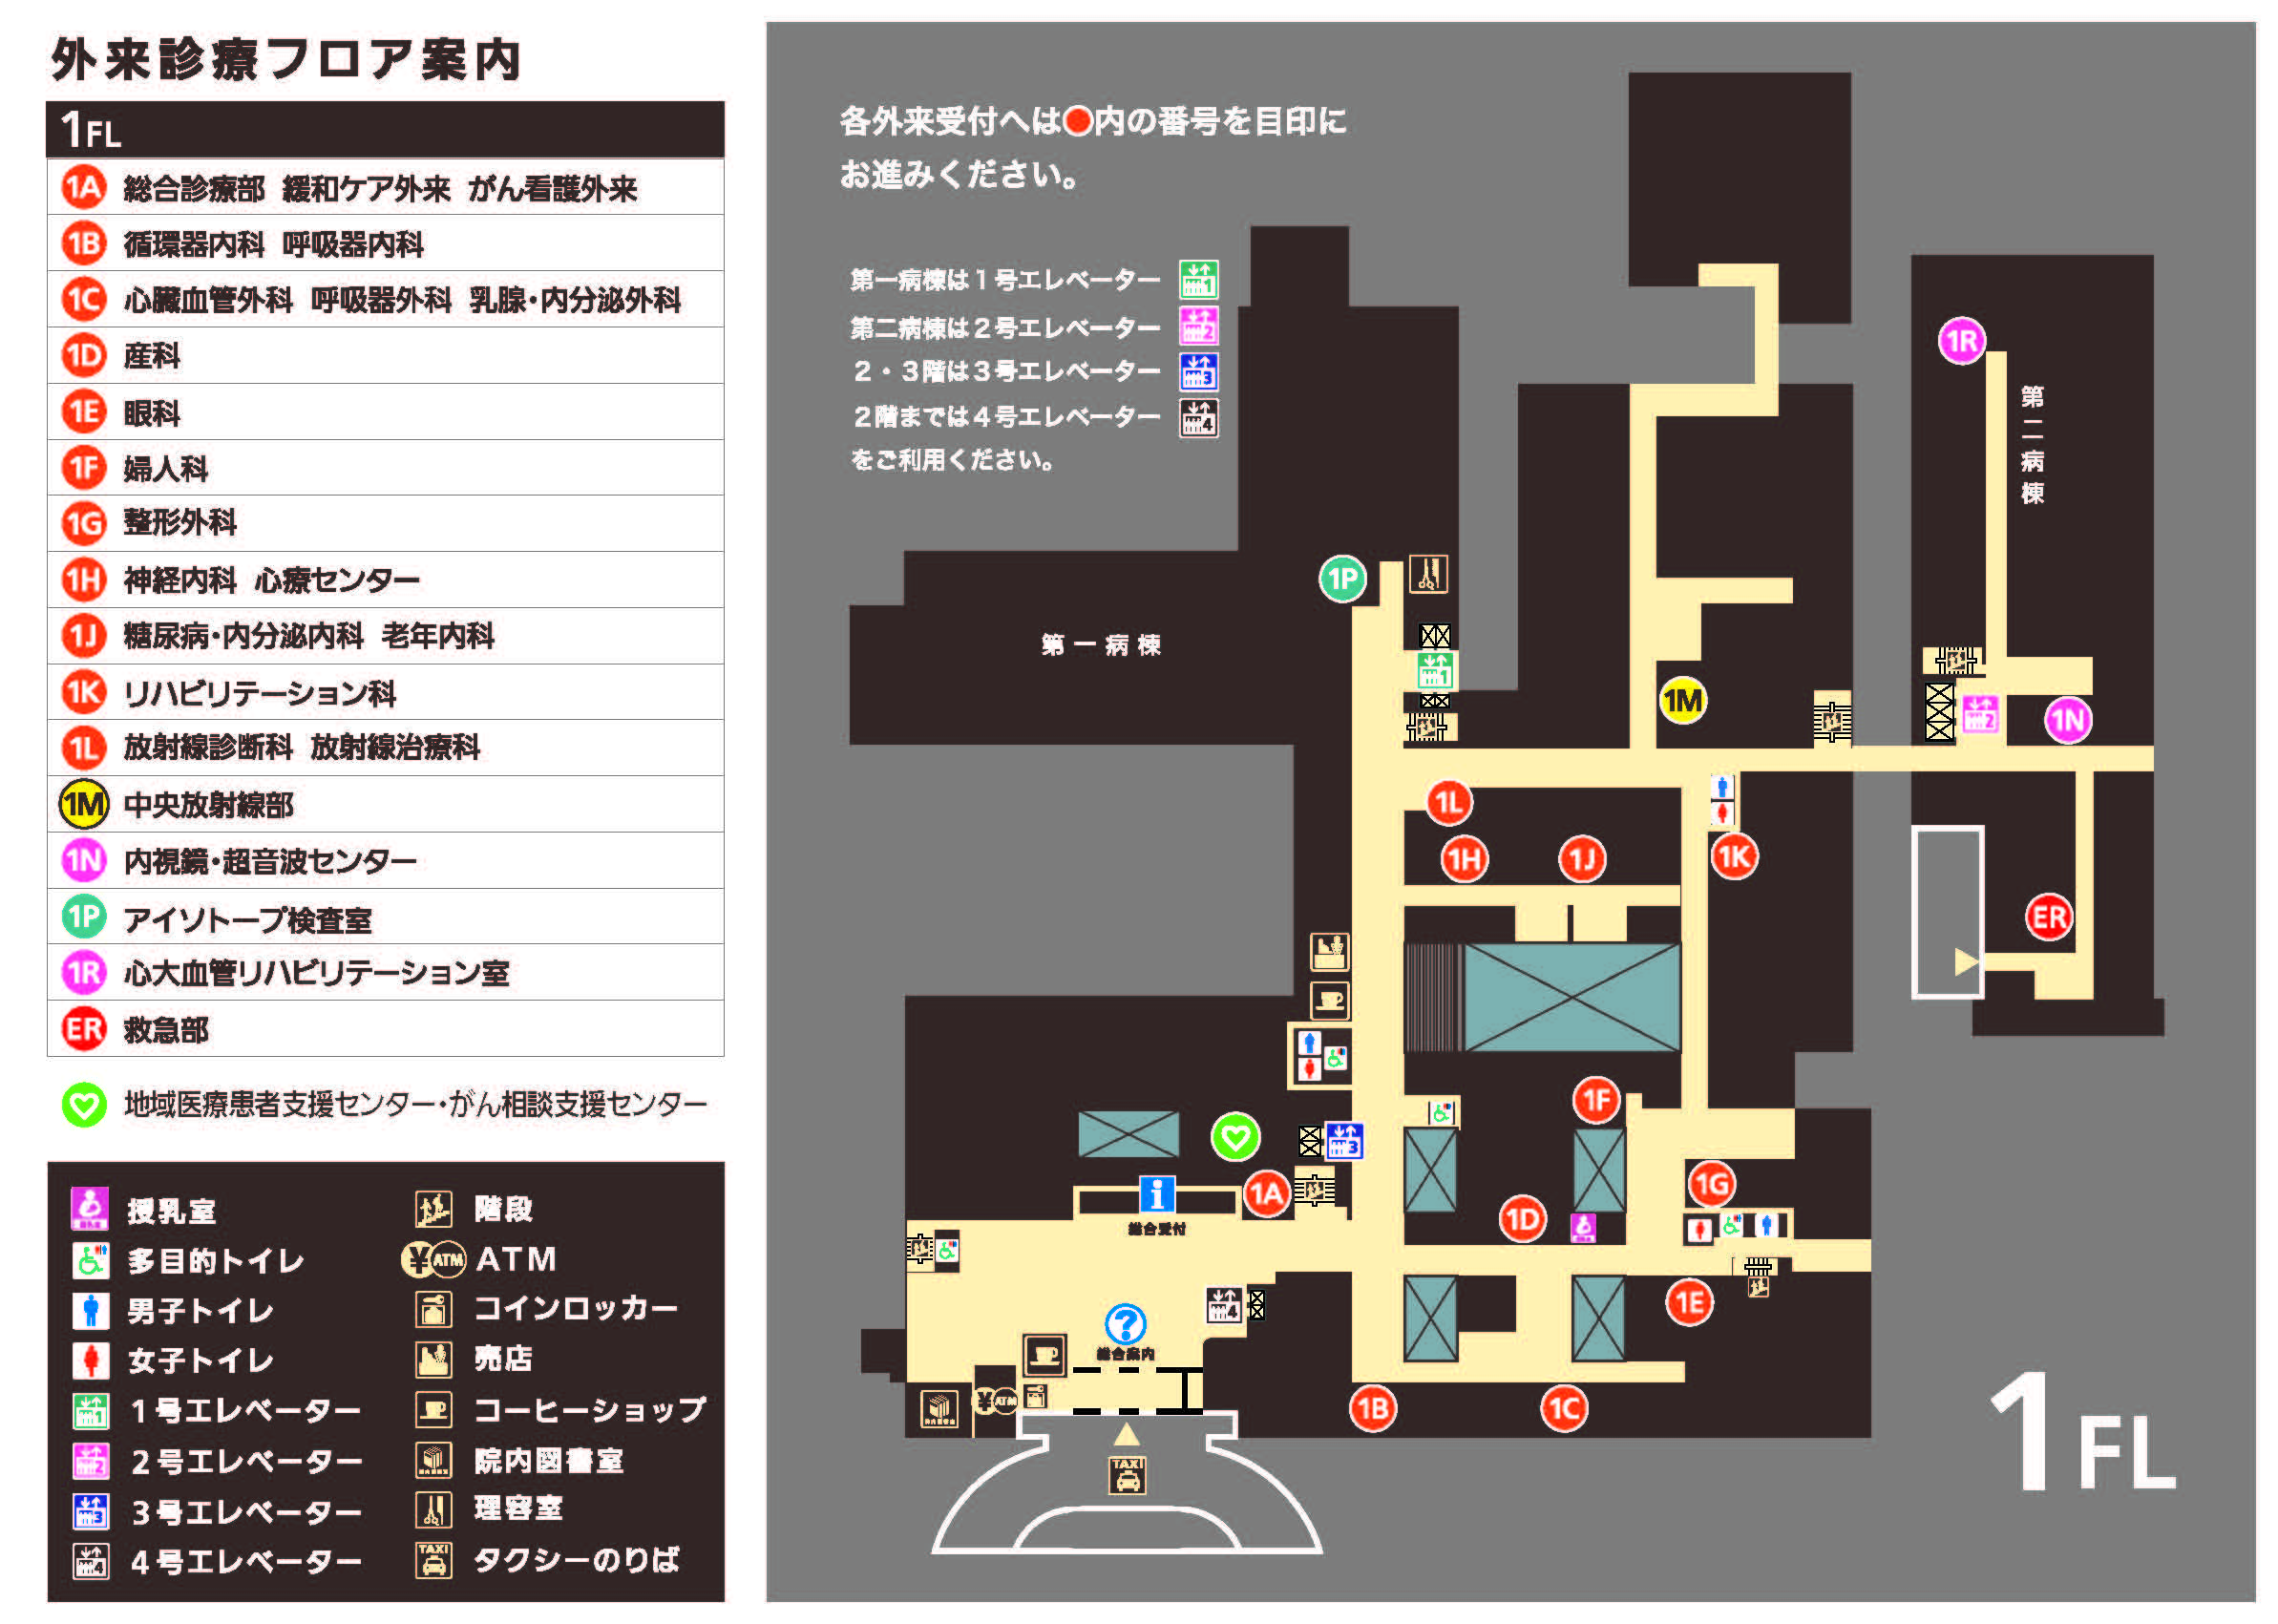 <p>秋田大学医学部附属病院院内案内図</p>